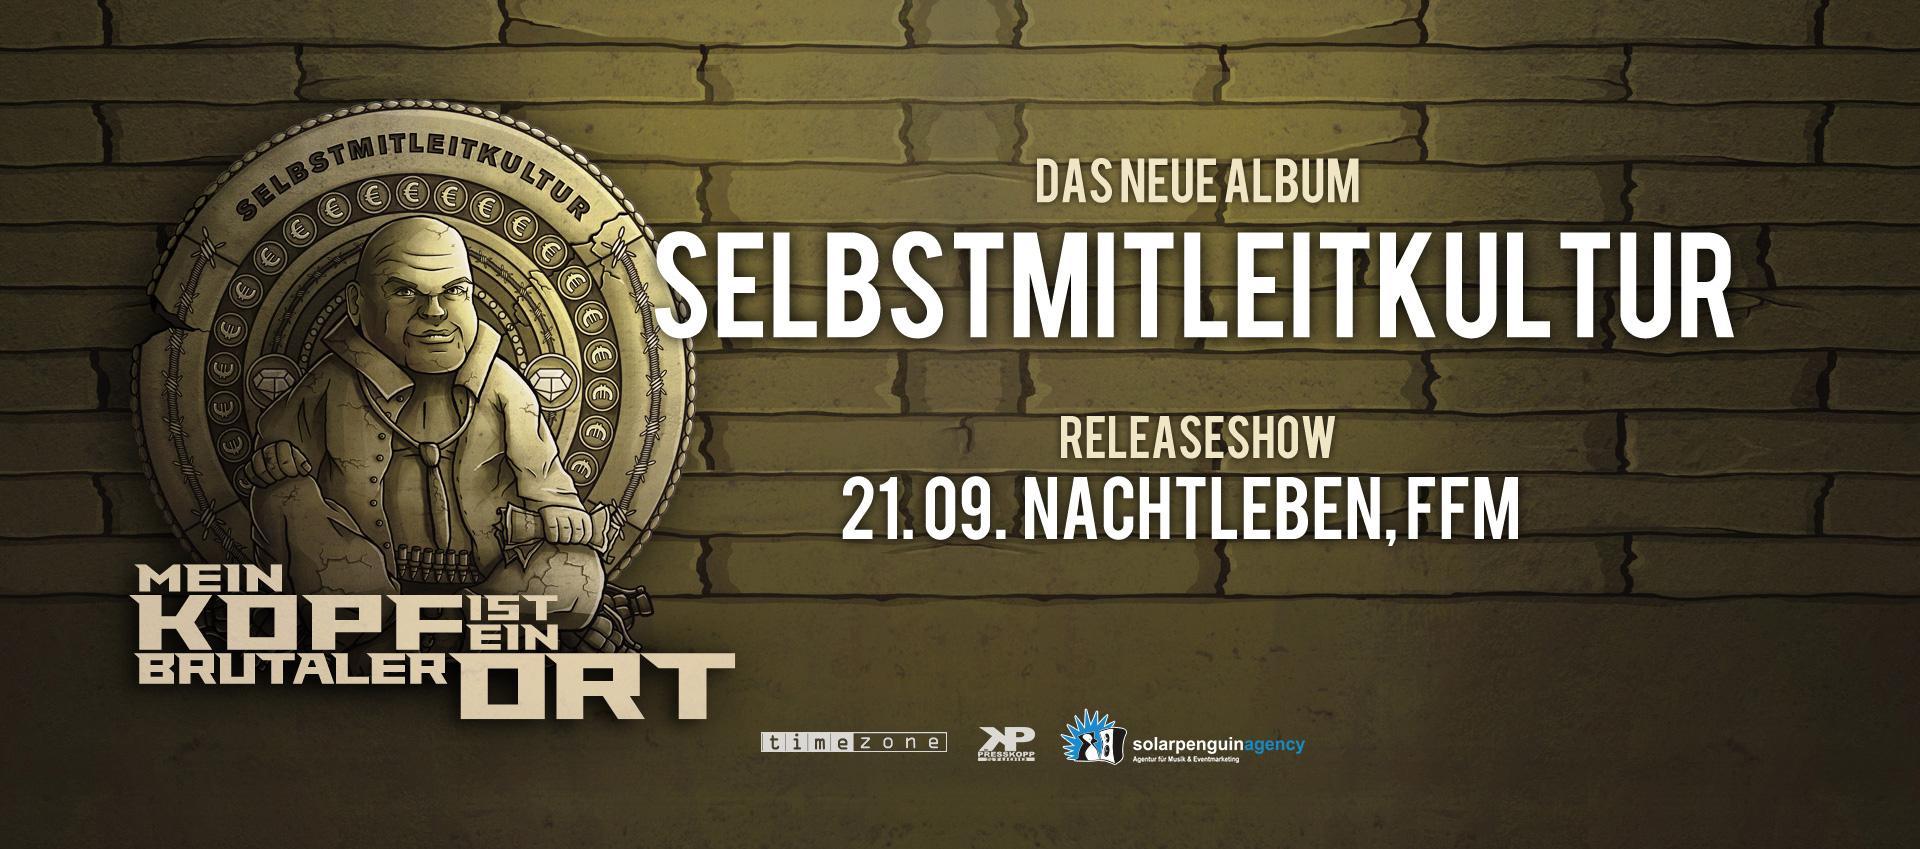 Album Release Party - Nachtleben, Frankfurt